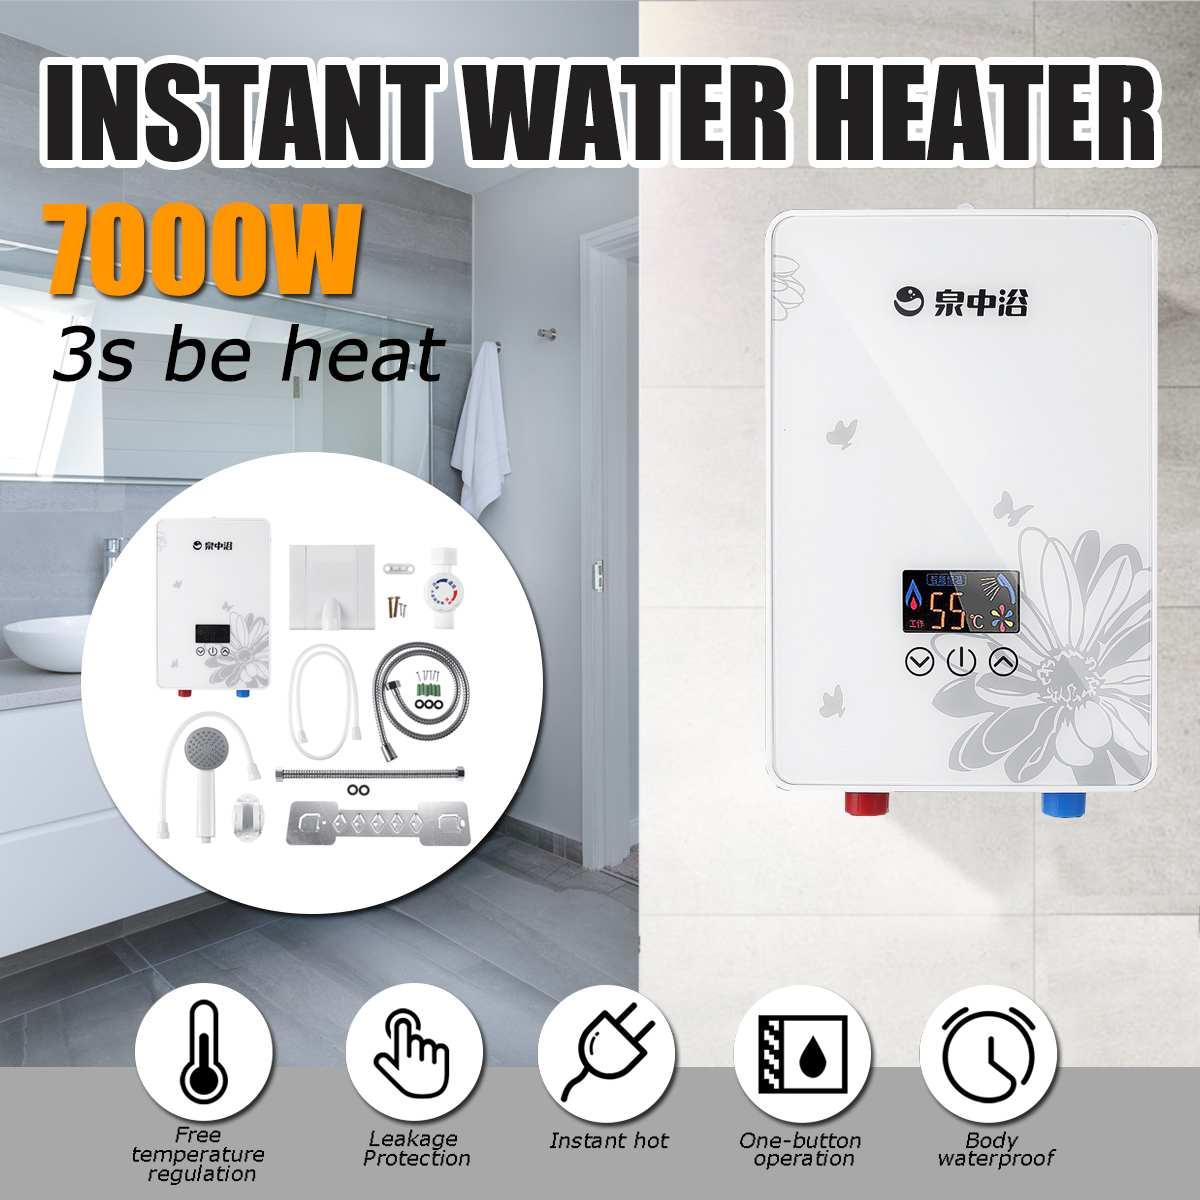 3s  Hot 7000W 220V Electric Hot Water  Tankless  Boiler Bathroom Shower Set Thermostat Safe Intelligent Auto